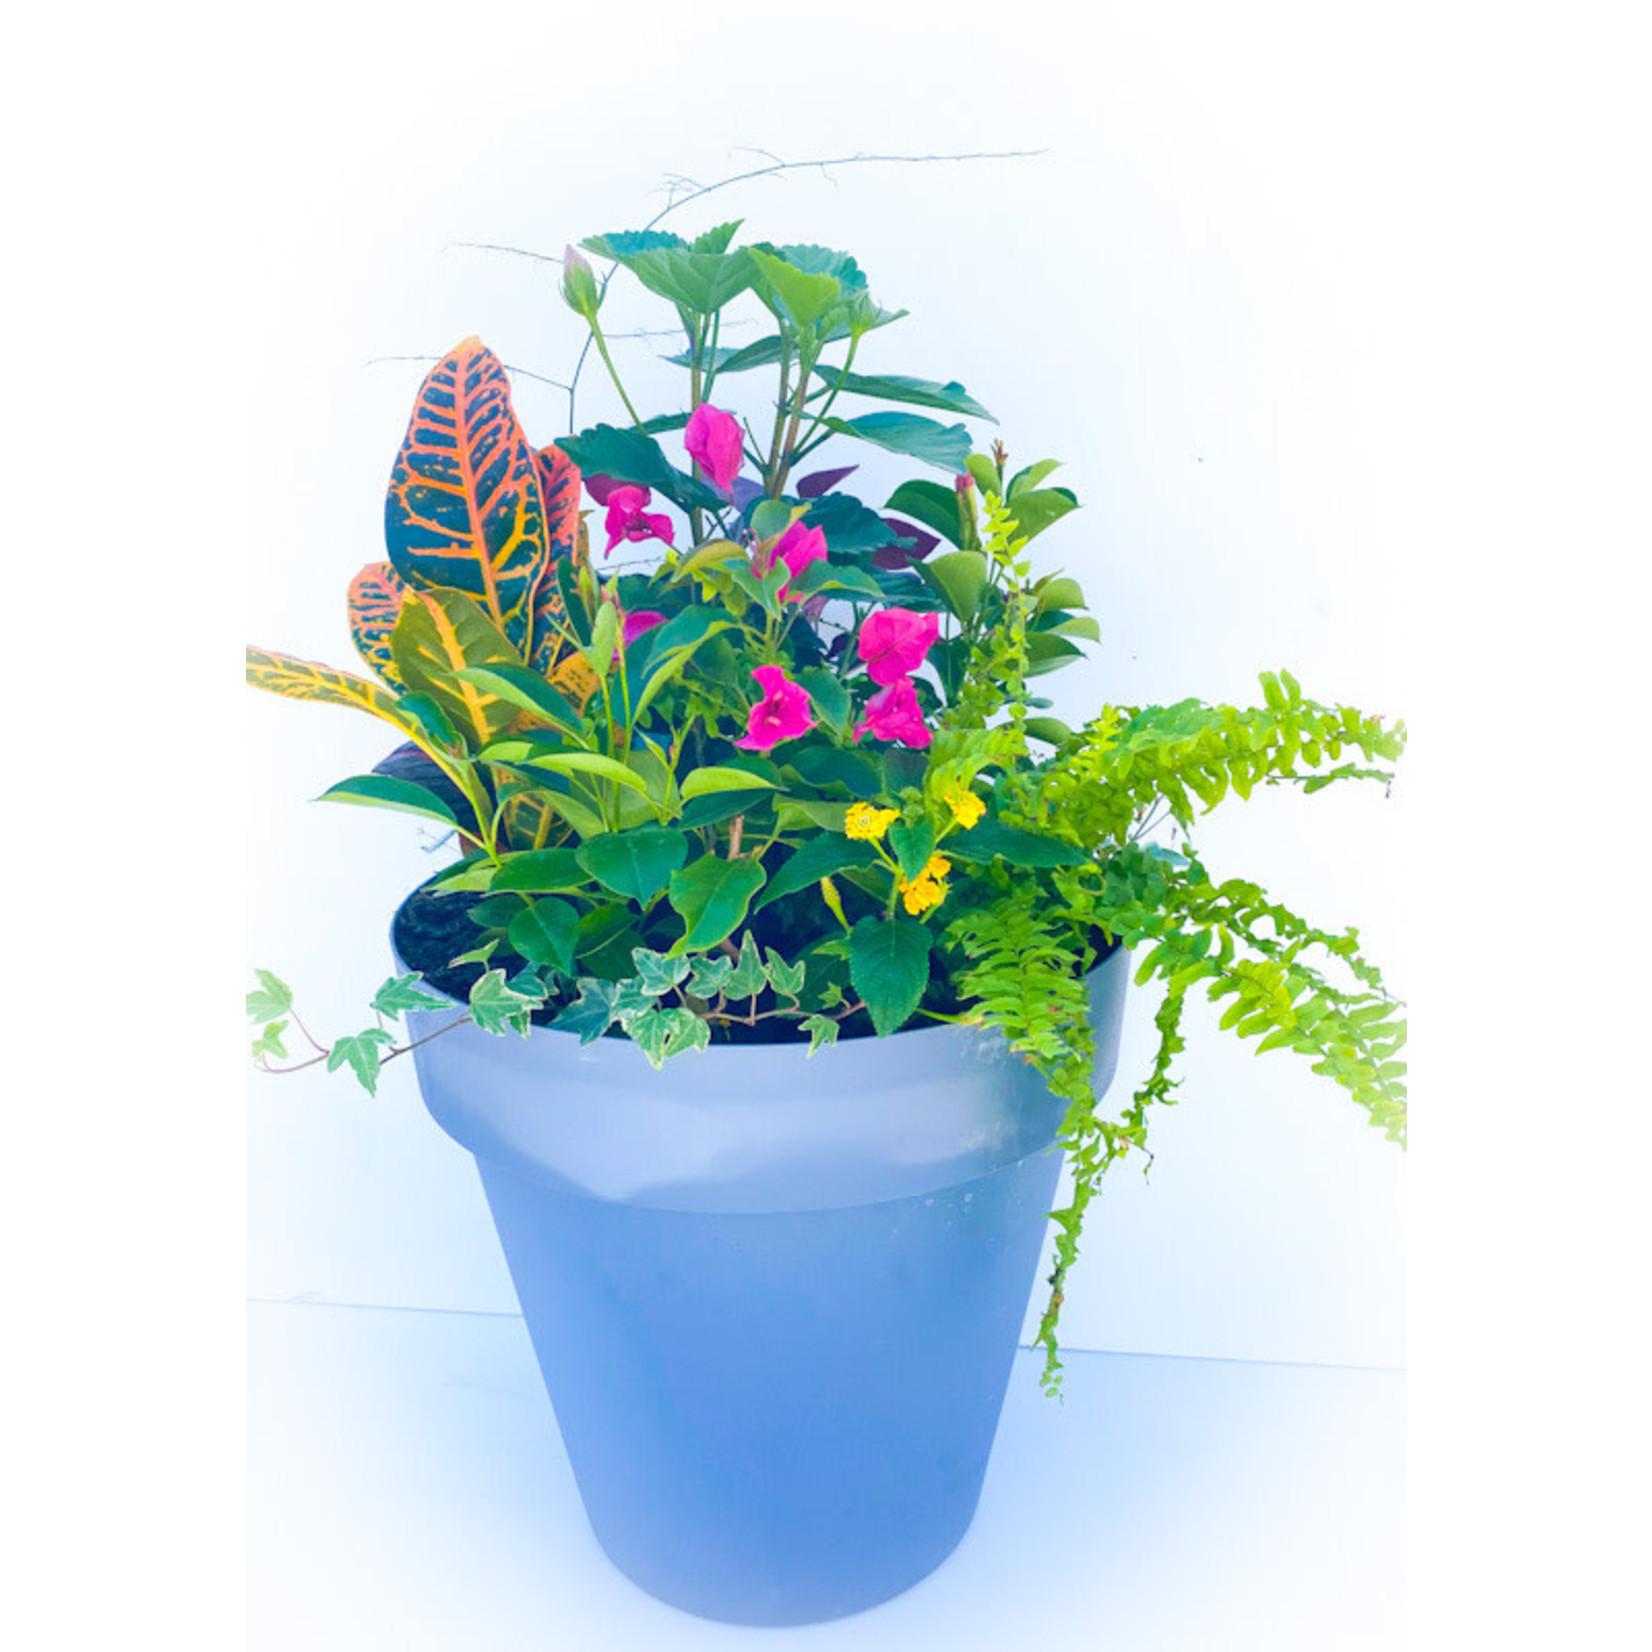 "Mixed Tropical Planter - 15"" tall"